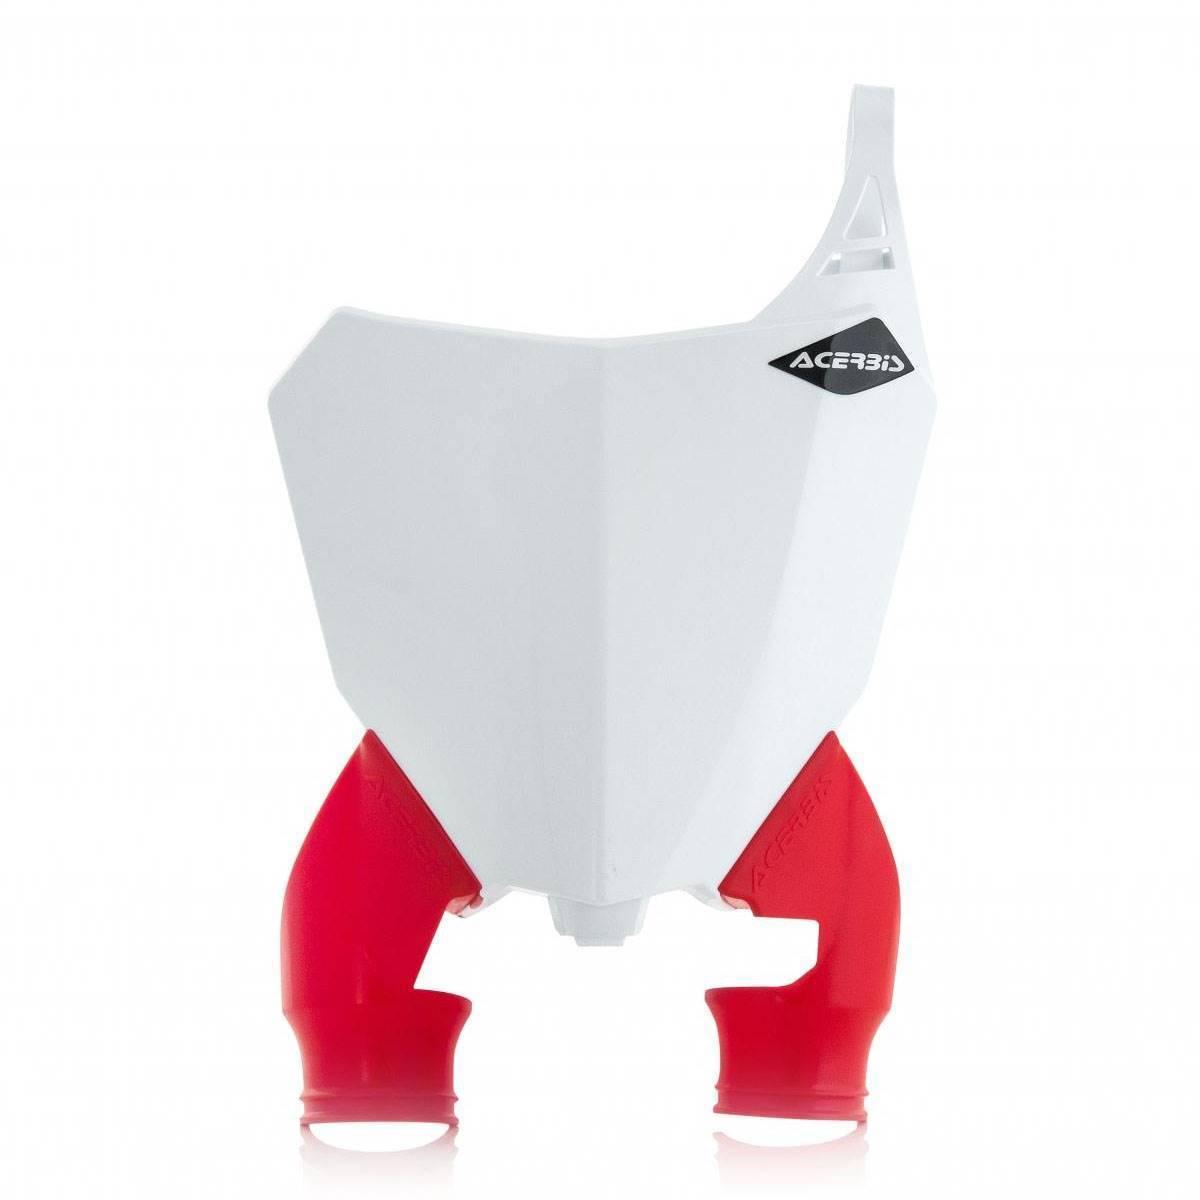 0022391-239 - Portanumero Delantero Raptor Crf250 18. 450 17 18 Blanco Rojo